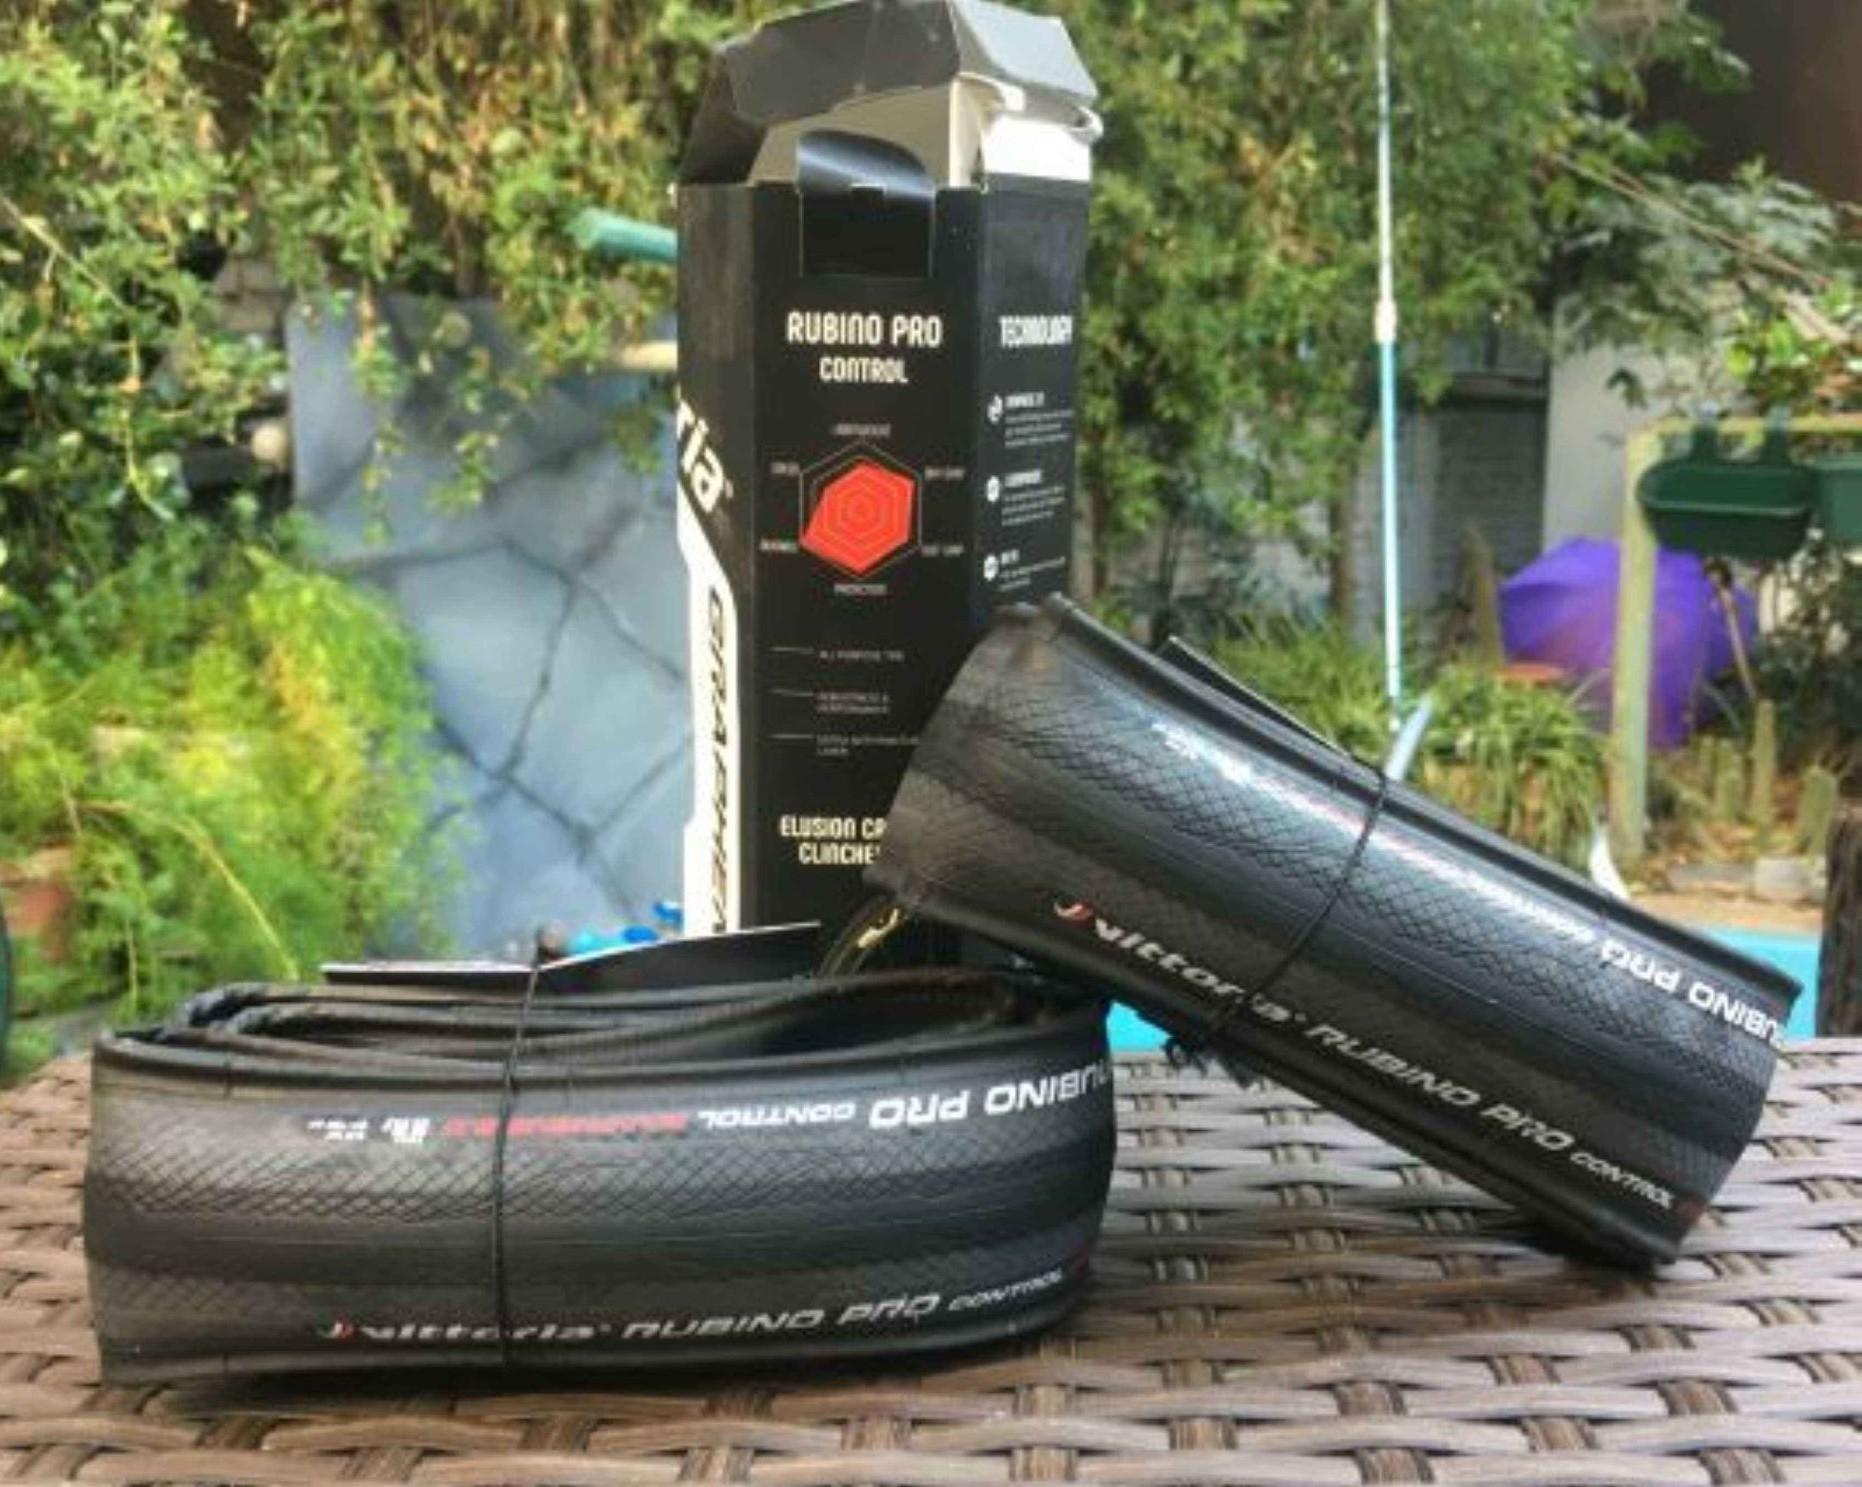 Vittoria Rubino Pro Control G2.0 (23mm, 25mm)